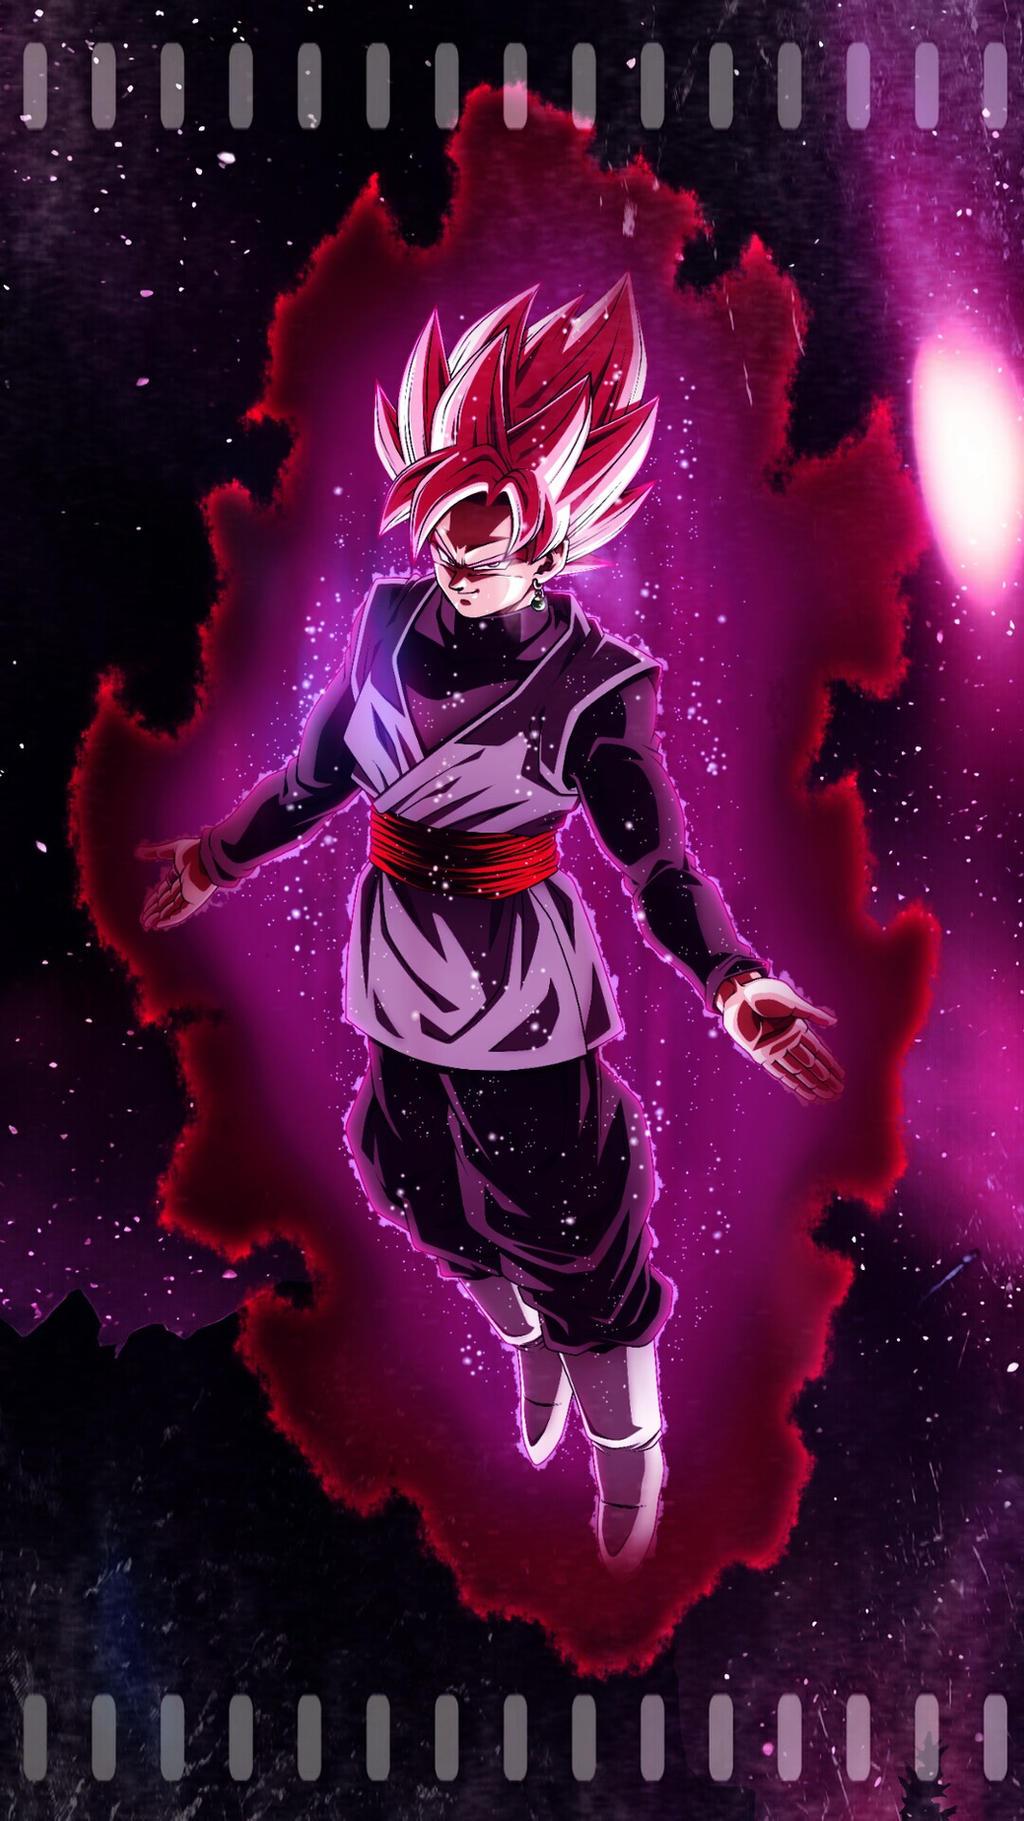 Goku Black SSJ Rose Wallpaper by